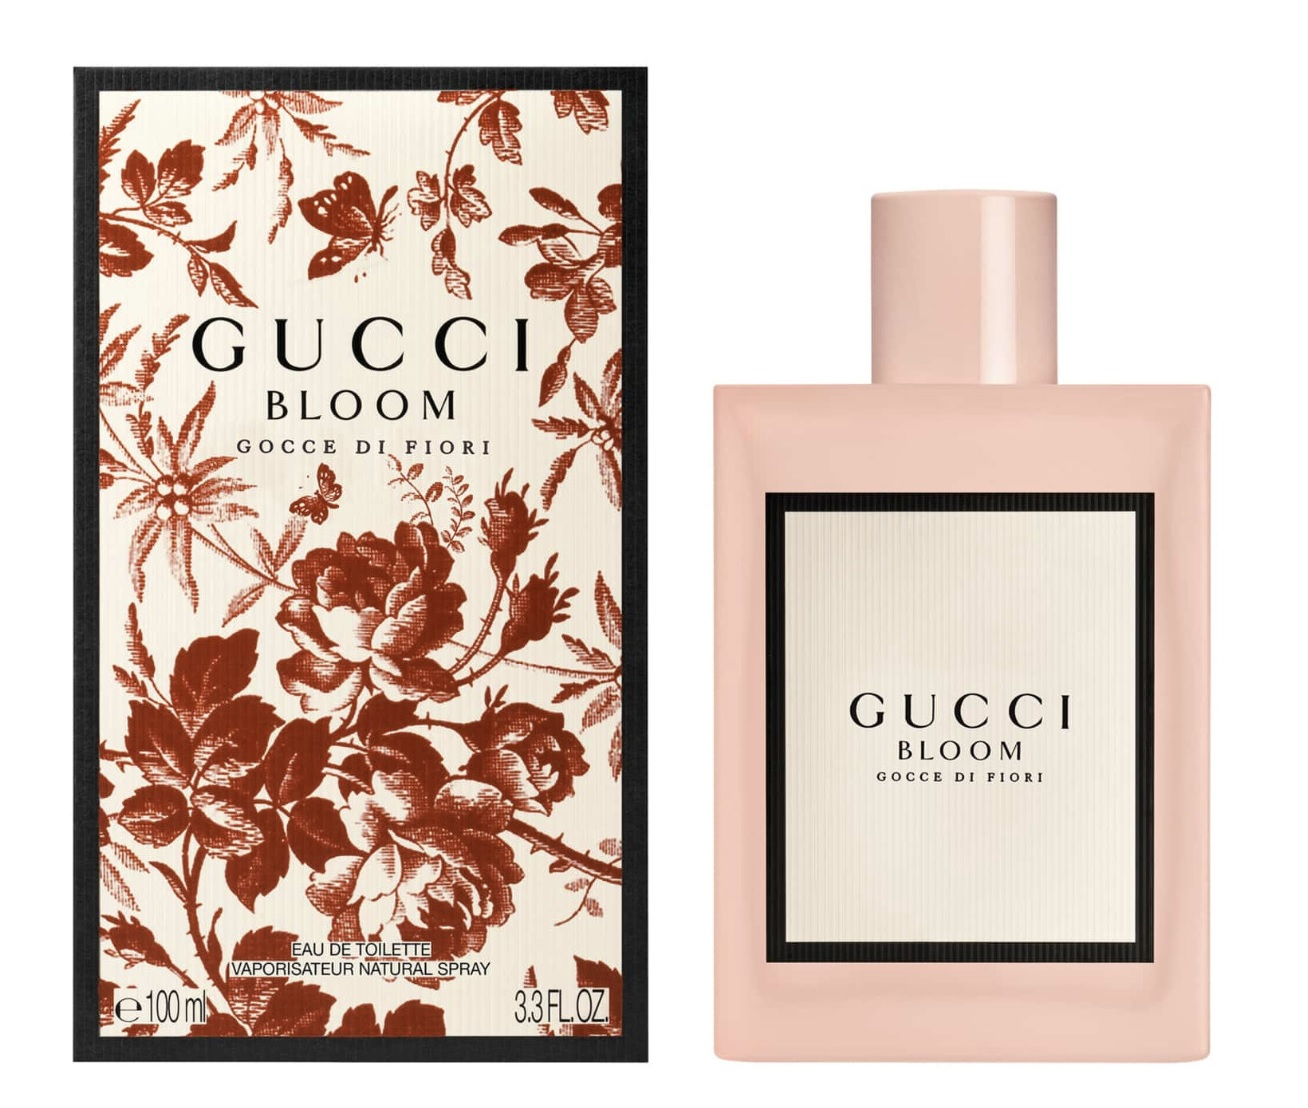 eb8ba9dcb9 Bloom Gocce di Fiori Gucci perfume - a new fragrance for women 2019